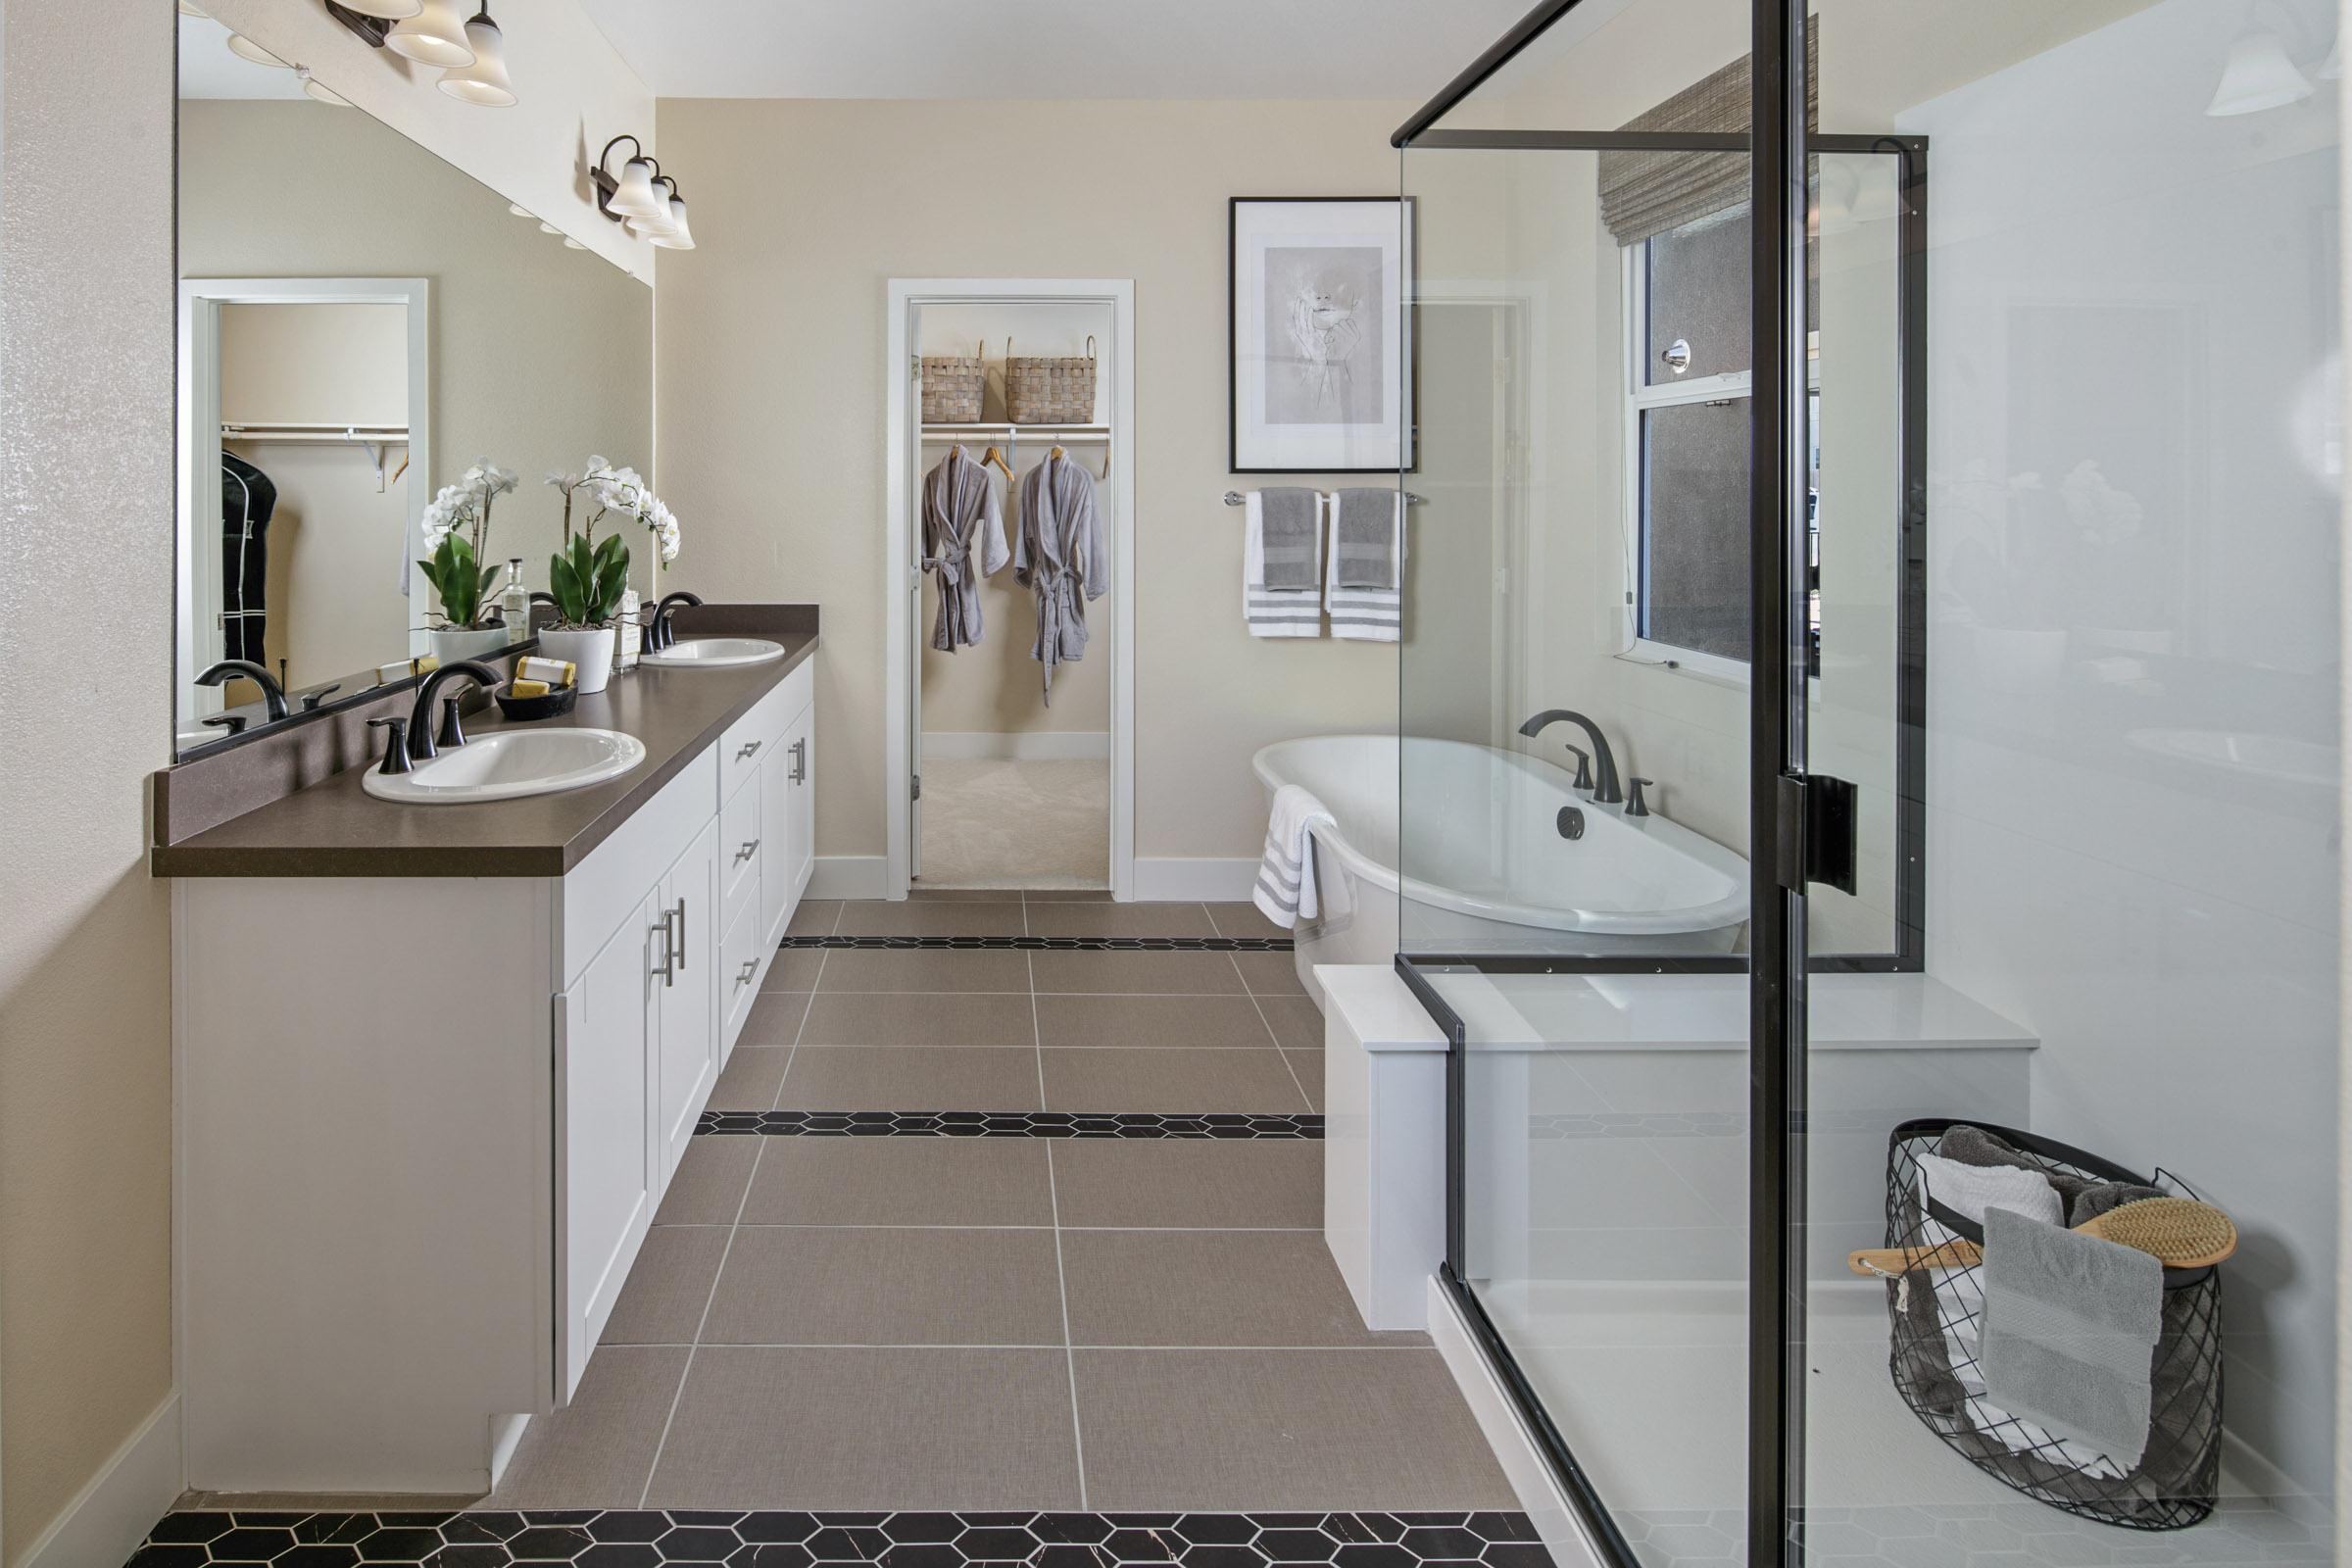 Bathroom featured in the Plan 2 By Watt Communities in Sacramento, CA